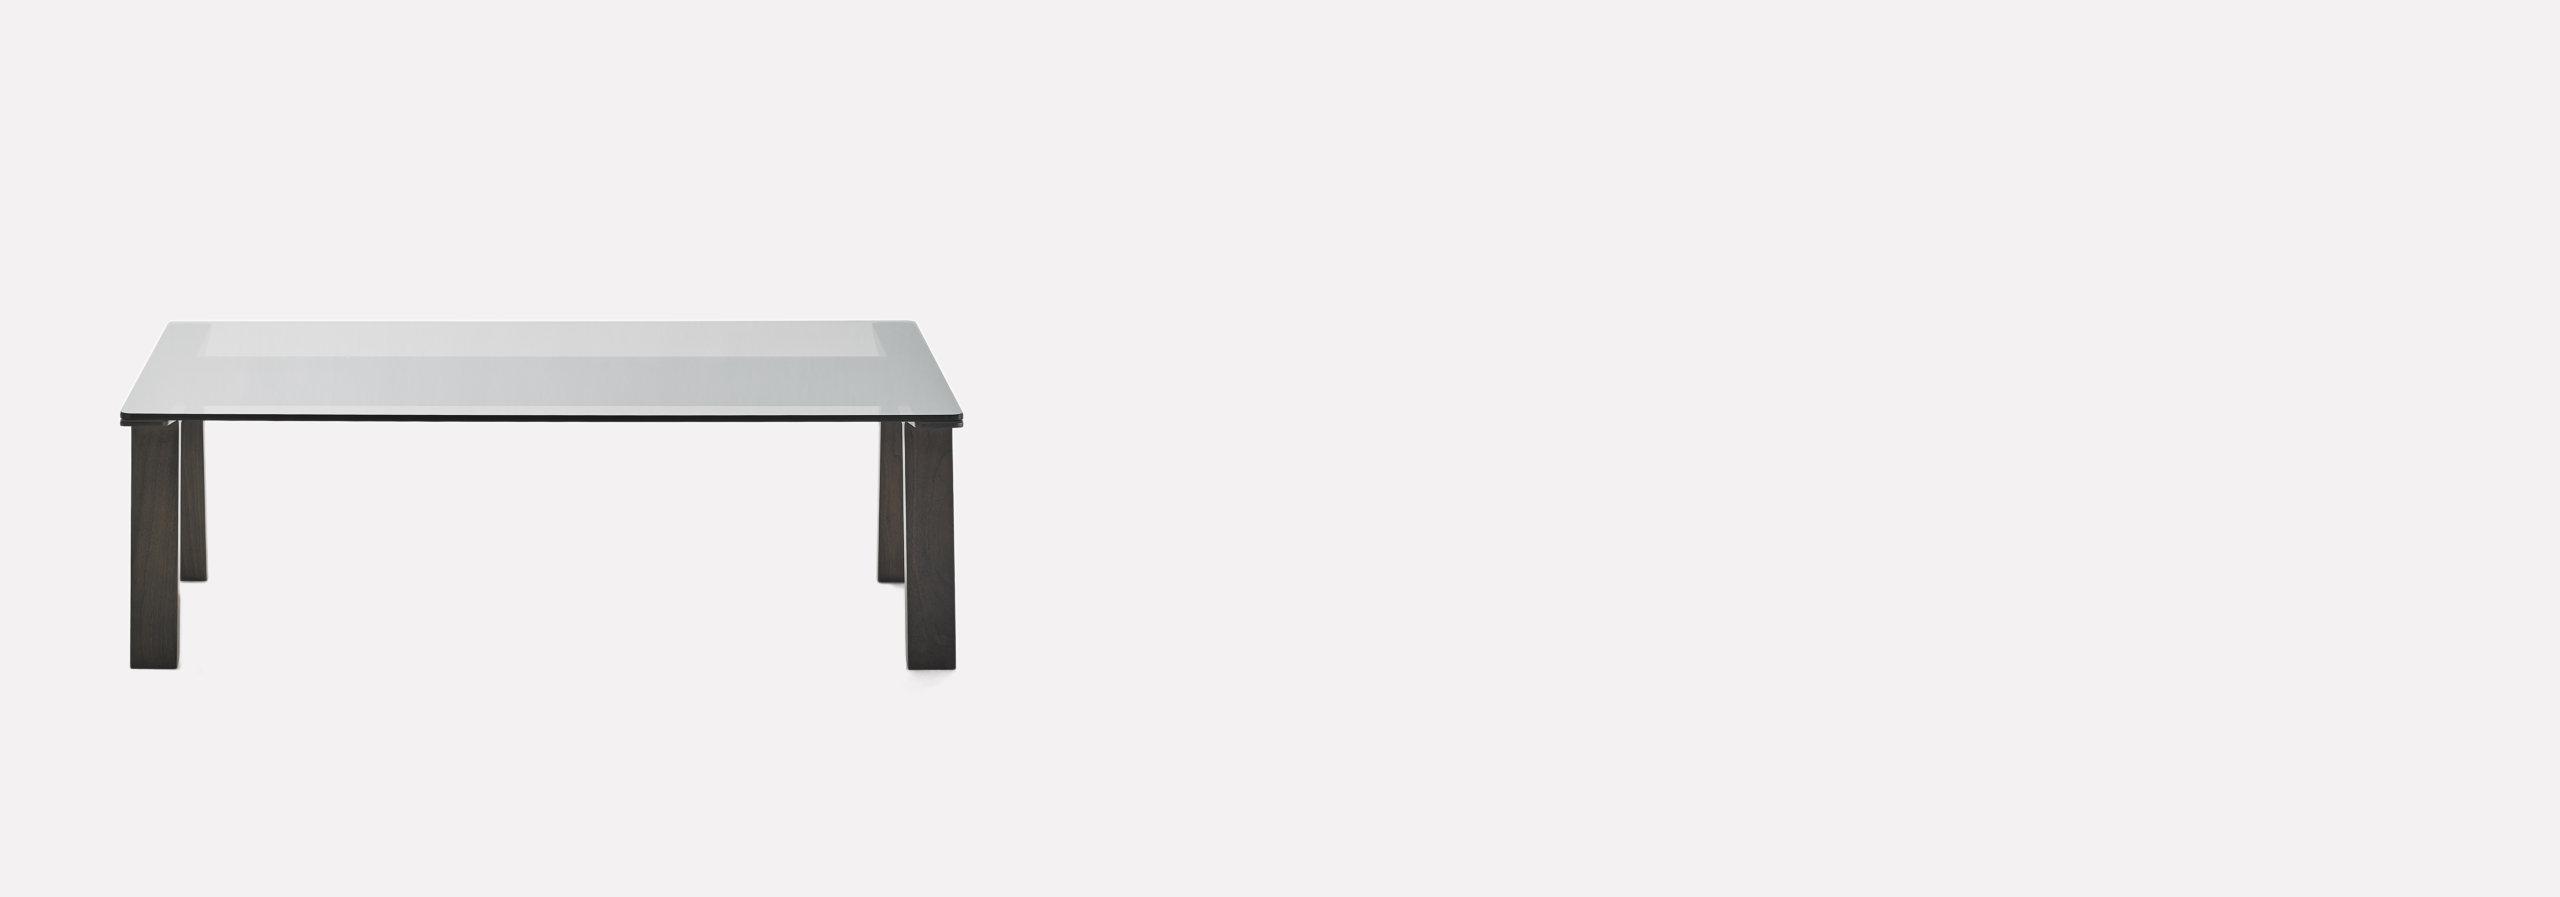 MITIS_COFFE_TABLE_SLIDE_1